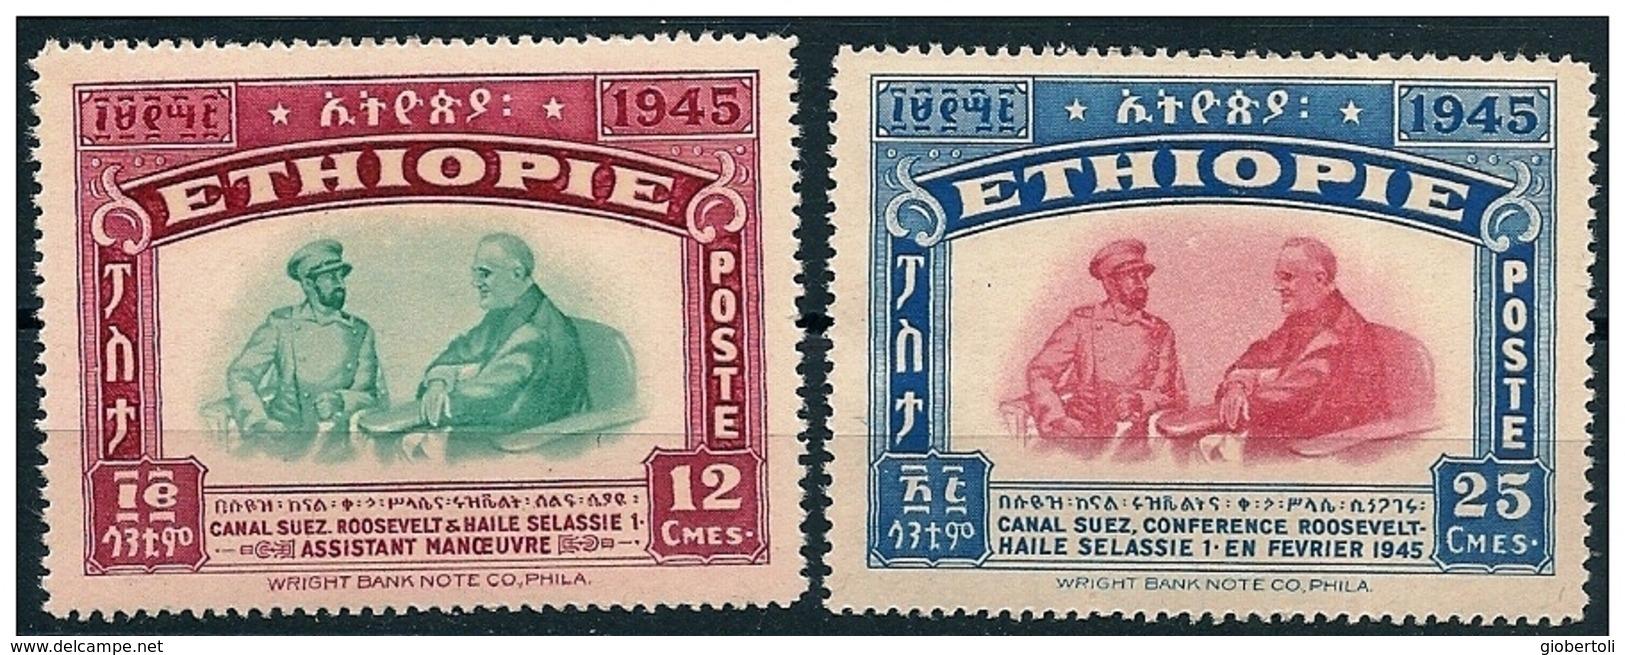 Etiopia/Ethiopie: Franklin Delano Roosevelt, Hailé Selassié - Celebrità